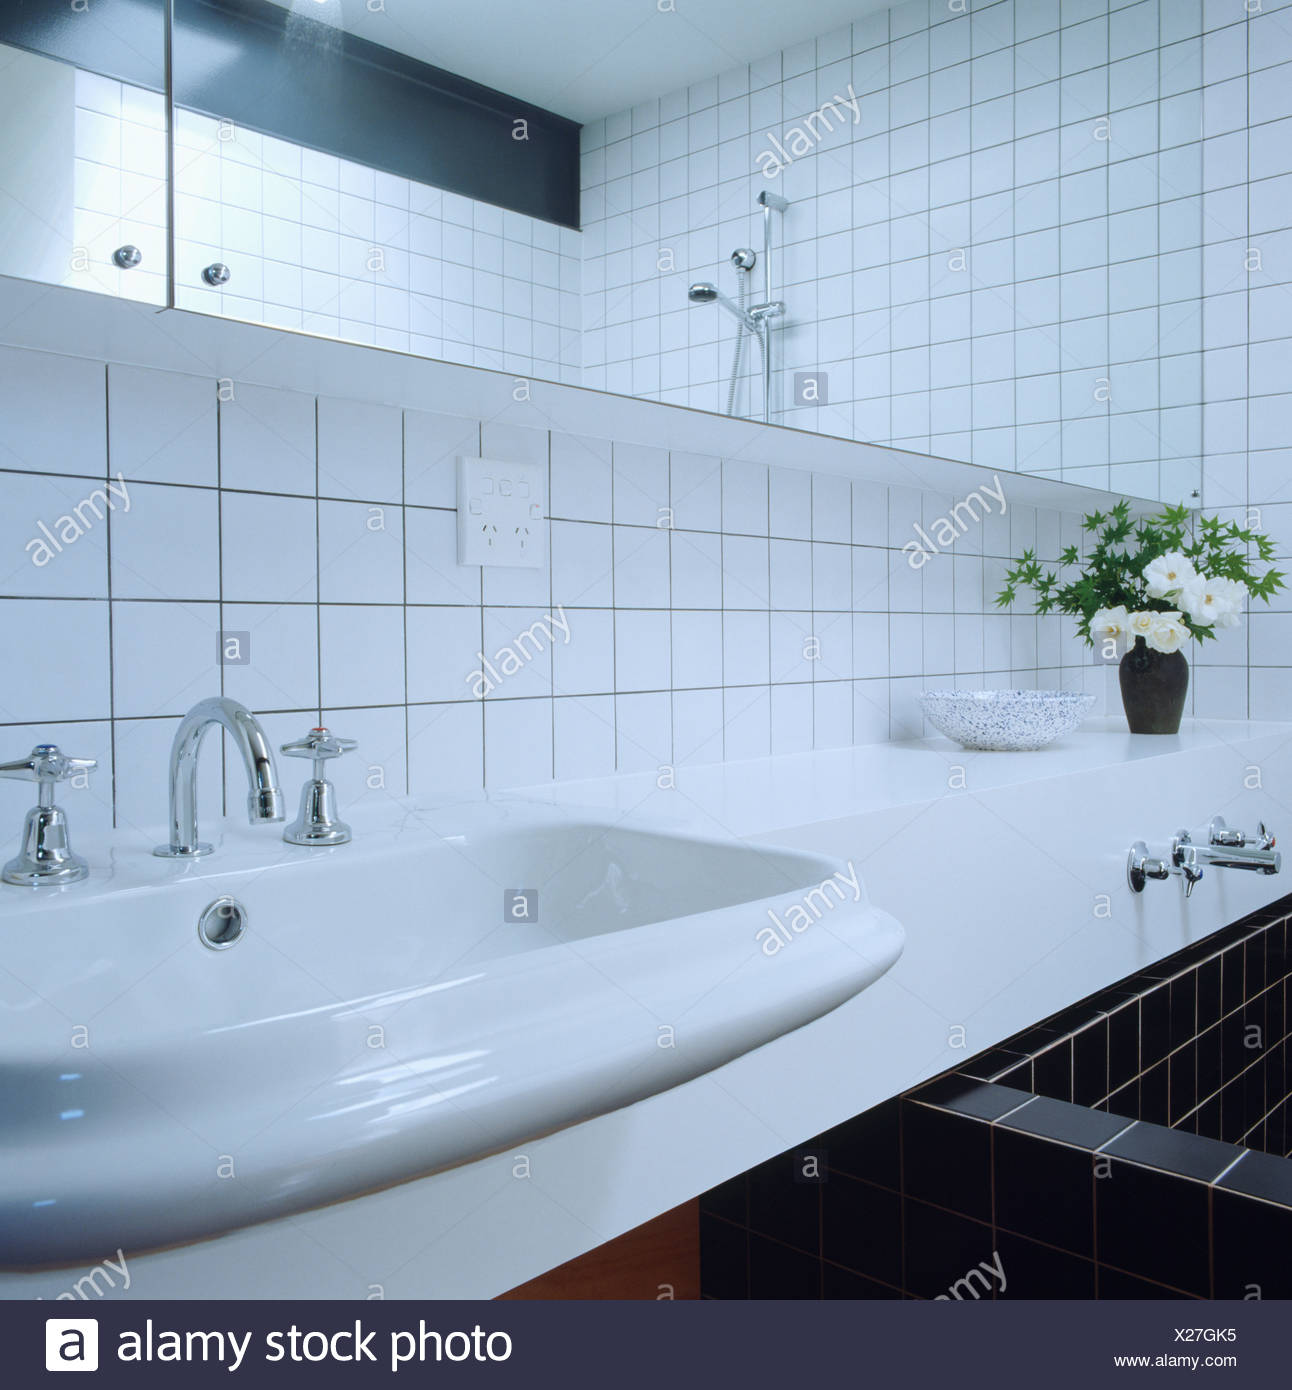 Basin Bath Mirror Monochromatic Stock Photos & Basin Bath Mirror ...